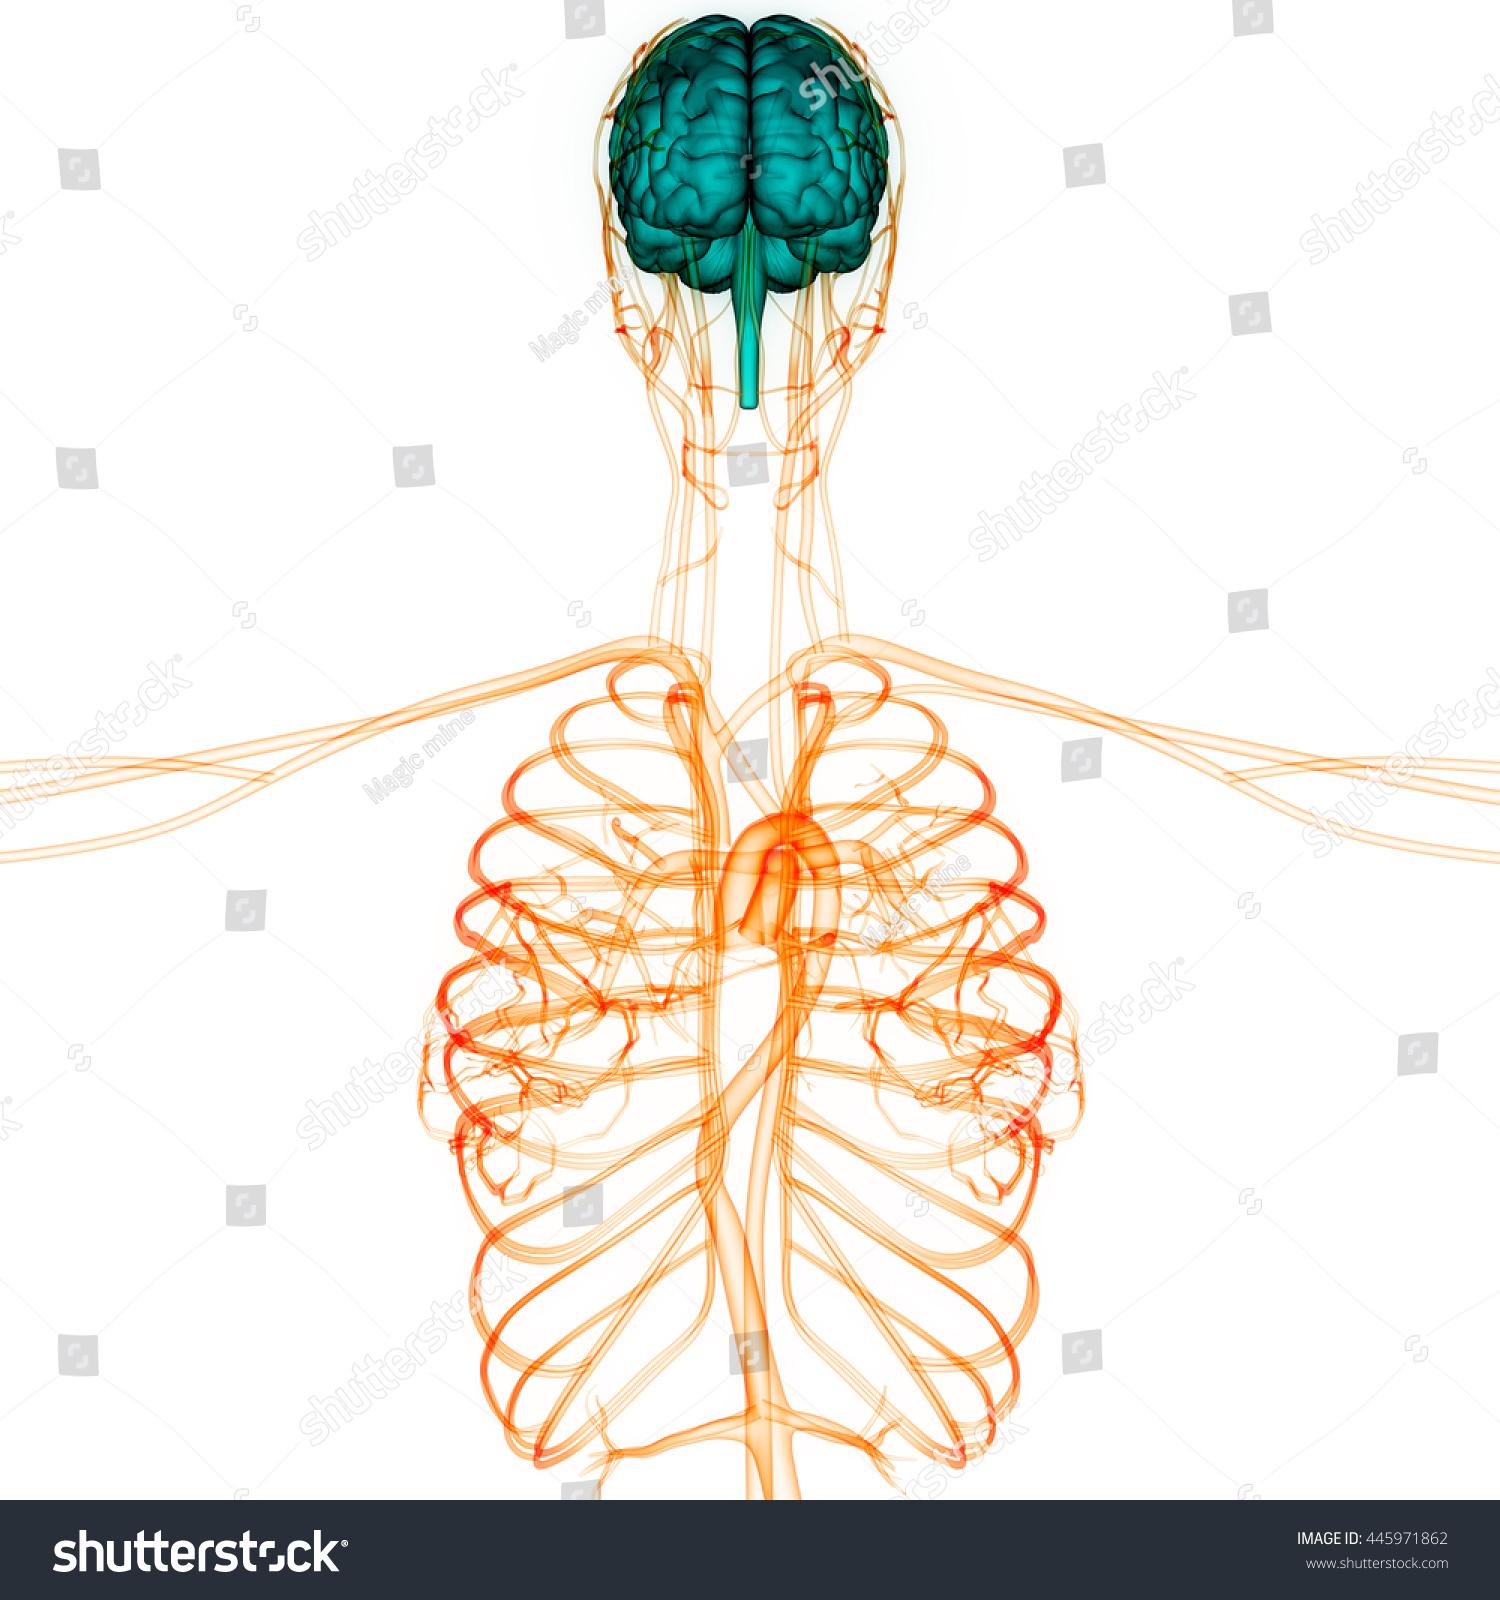 Arteries And Veins Anatomy Image Collections Human Body Anatomy